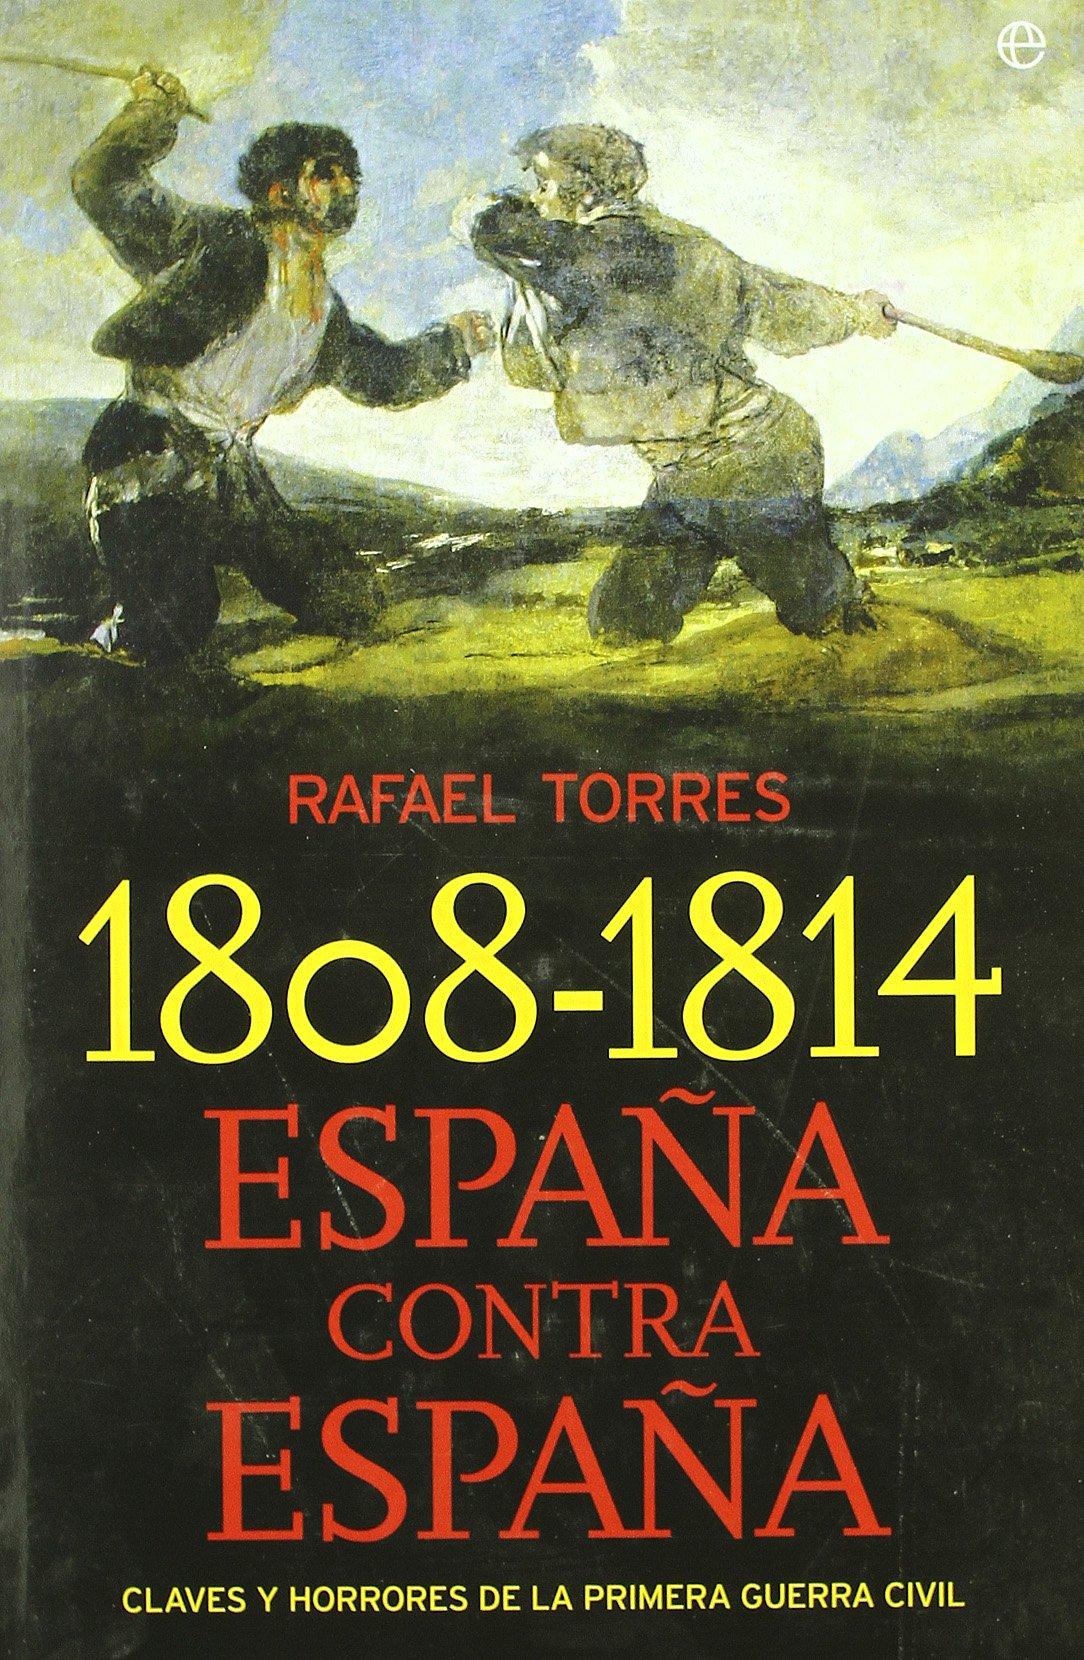 1808-1814 España contra España (Historia Divulgativa): Amazon.es: Torres, Rafael: Libros